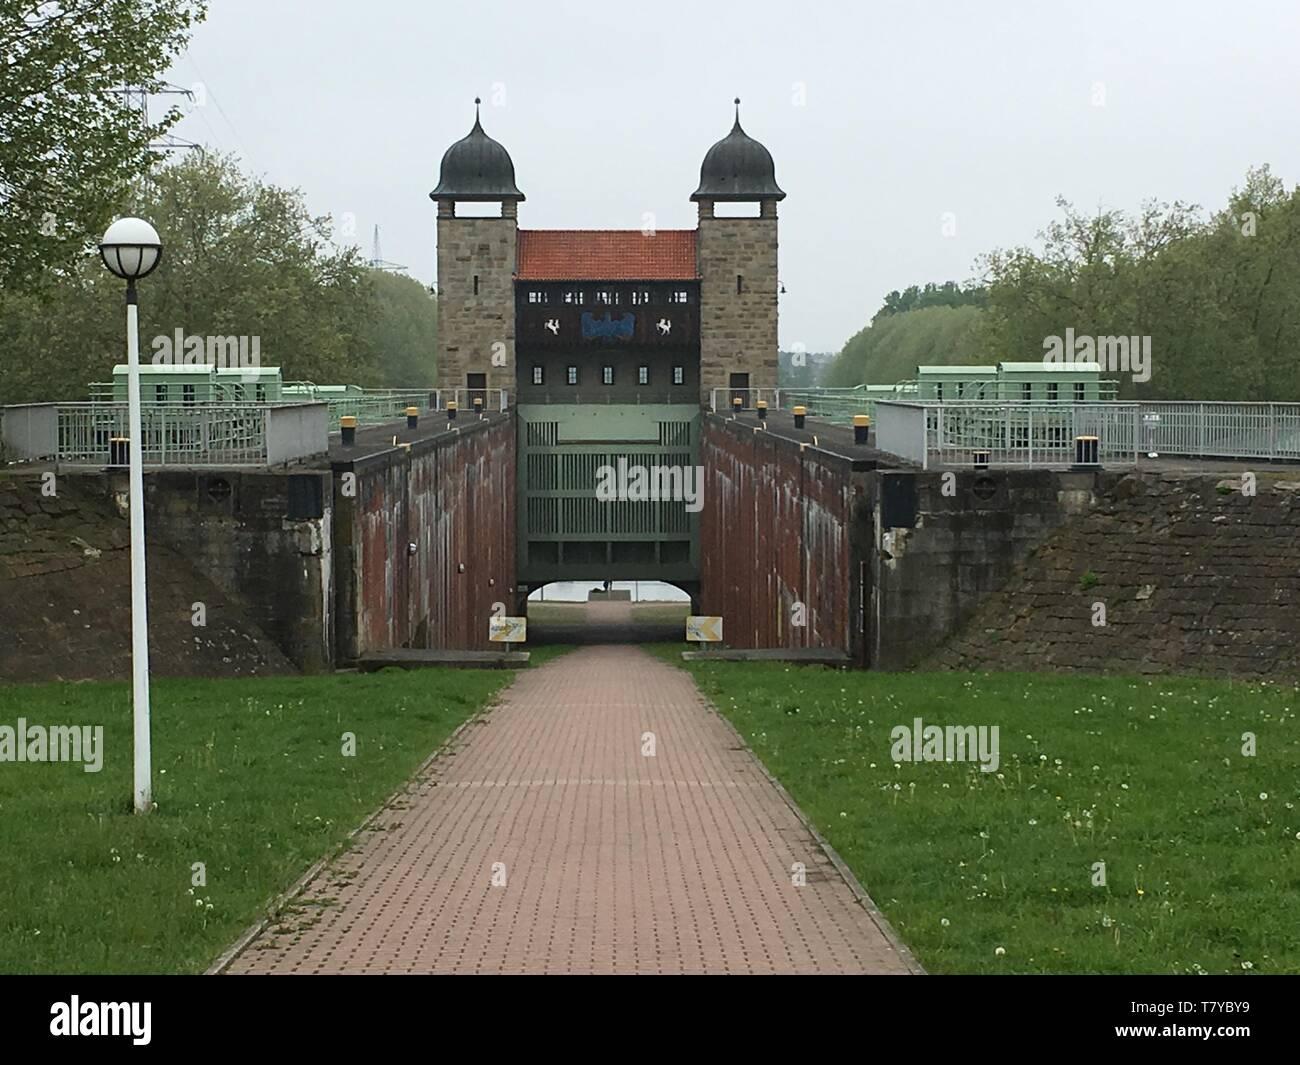 Historische Bauwerke am Dortmund-Ems-Kanal - Stock Image